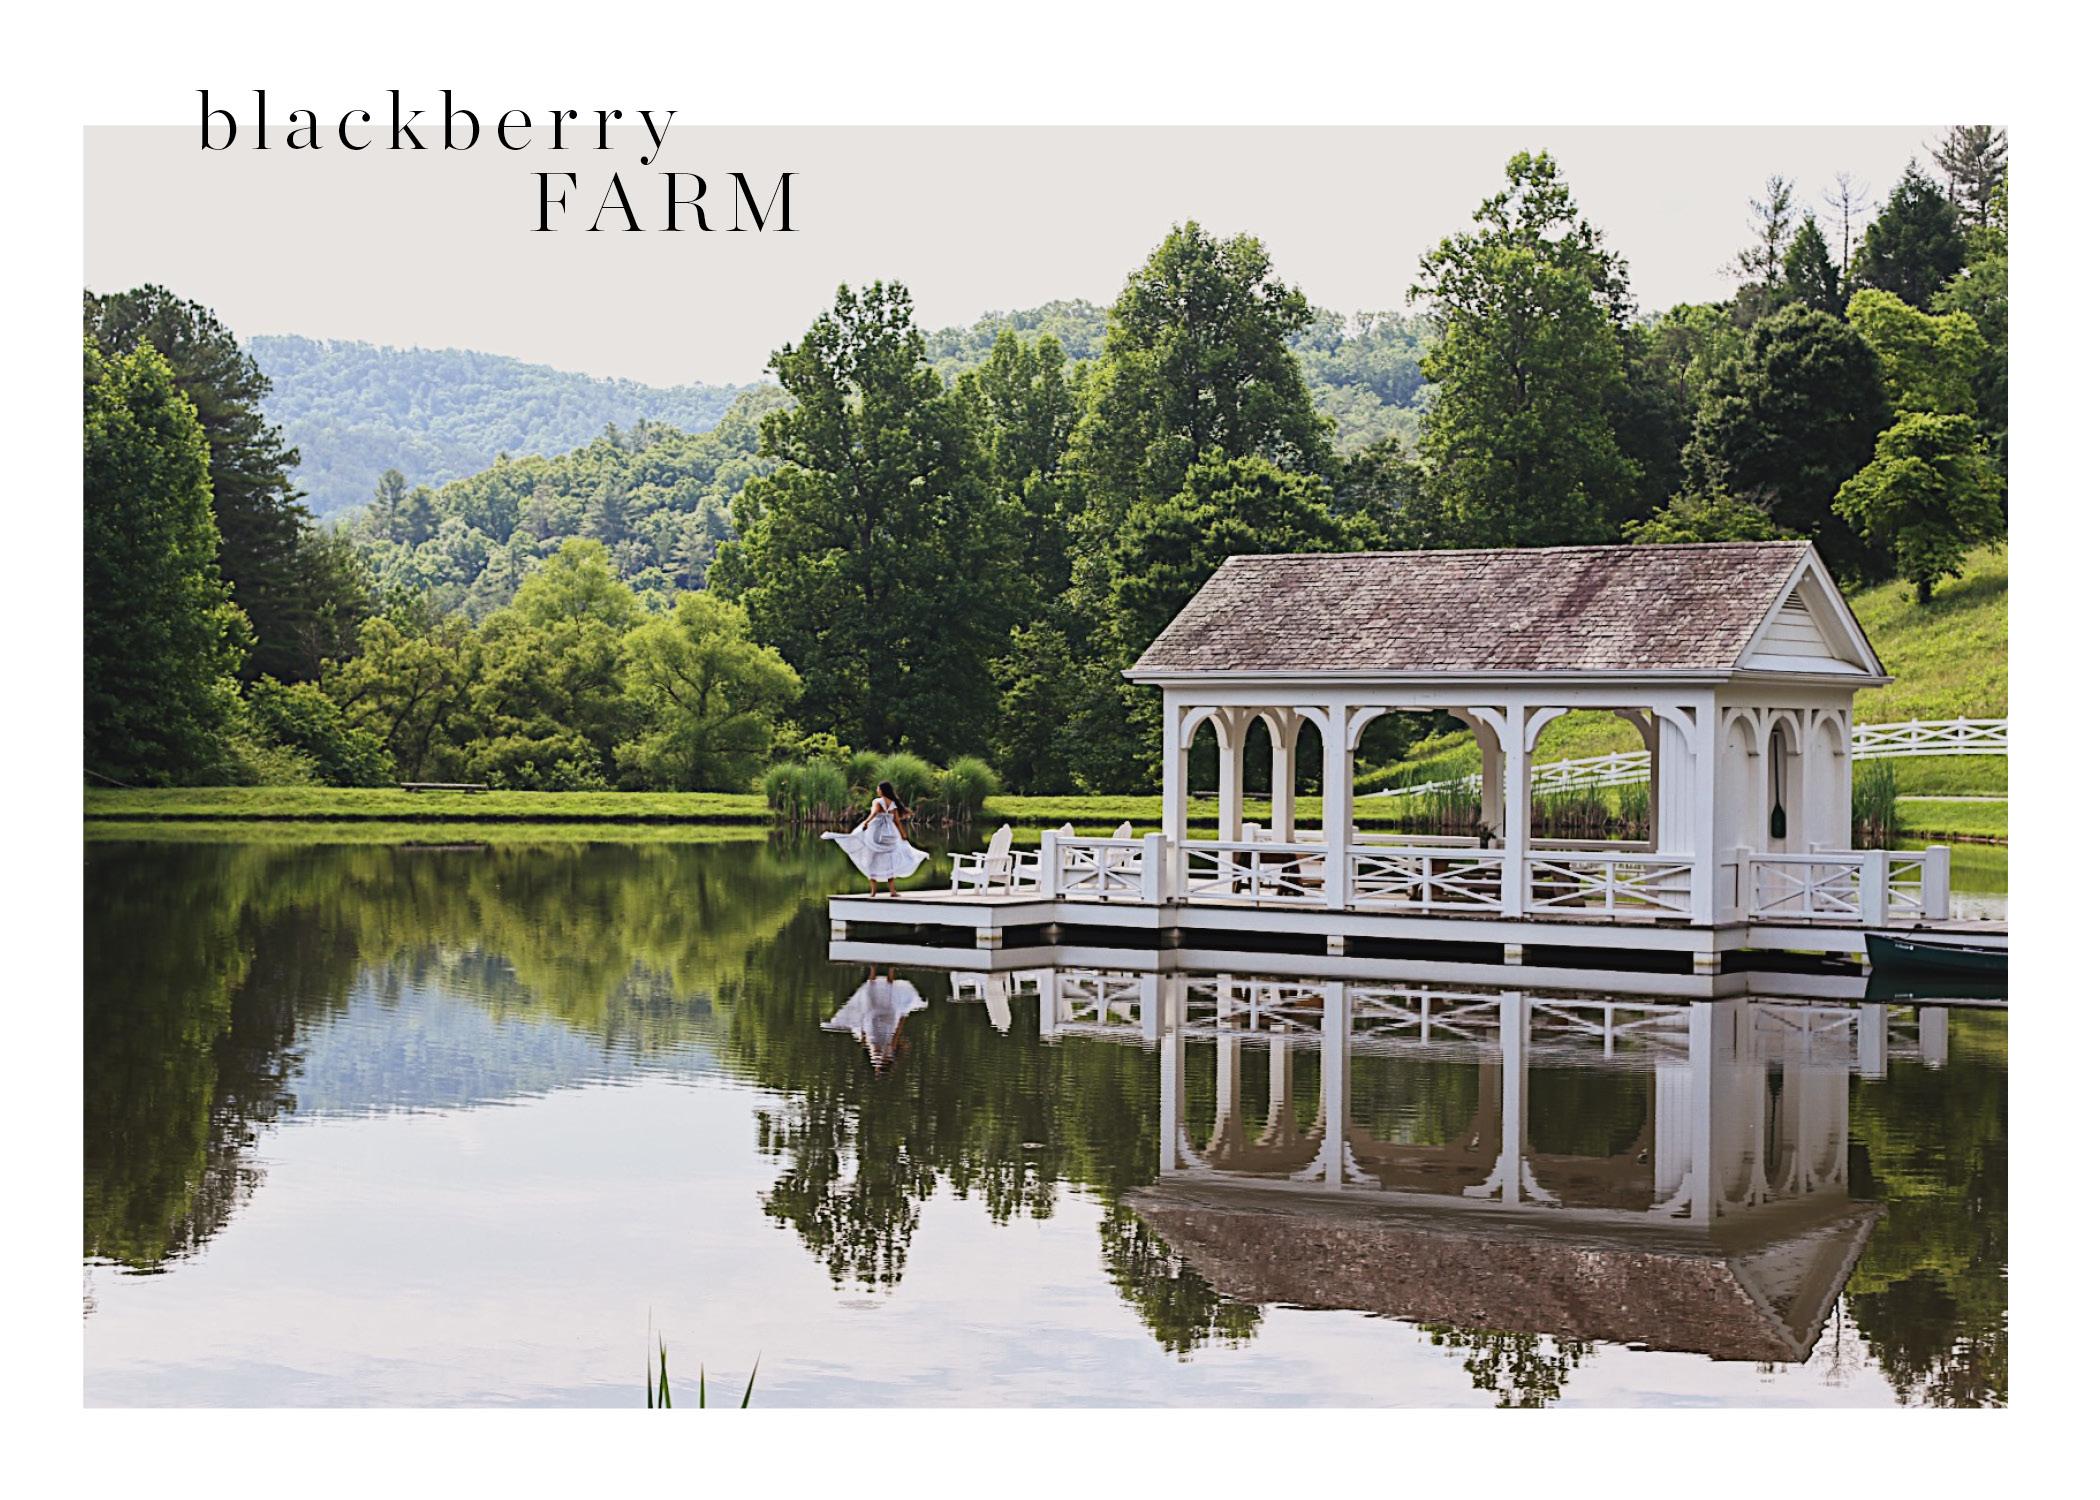 Blackberry Farm Hotel Review